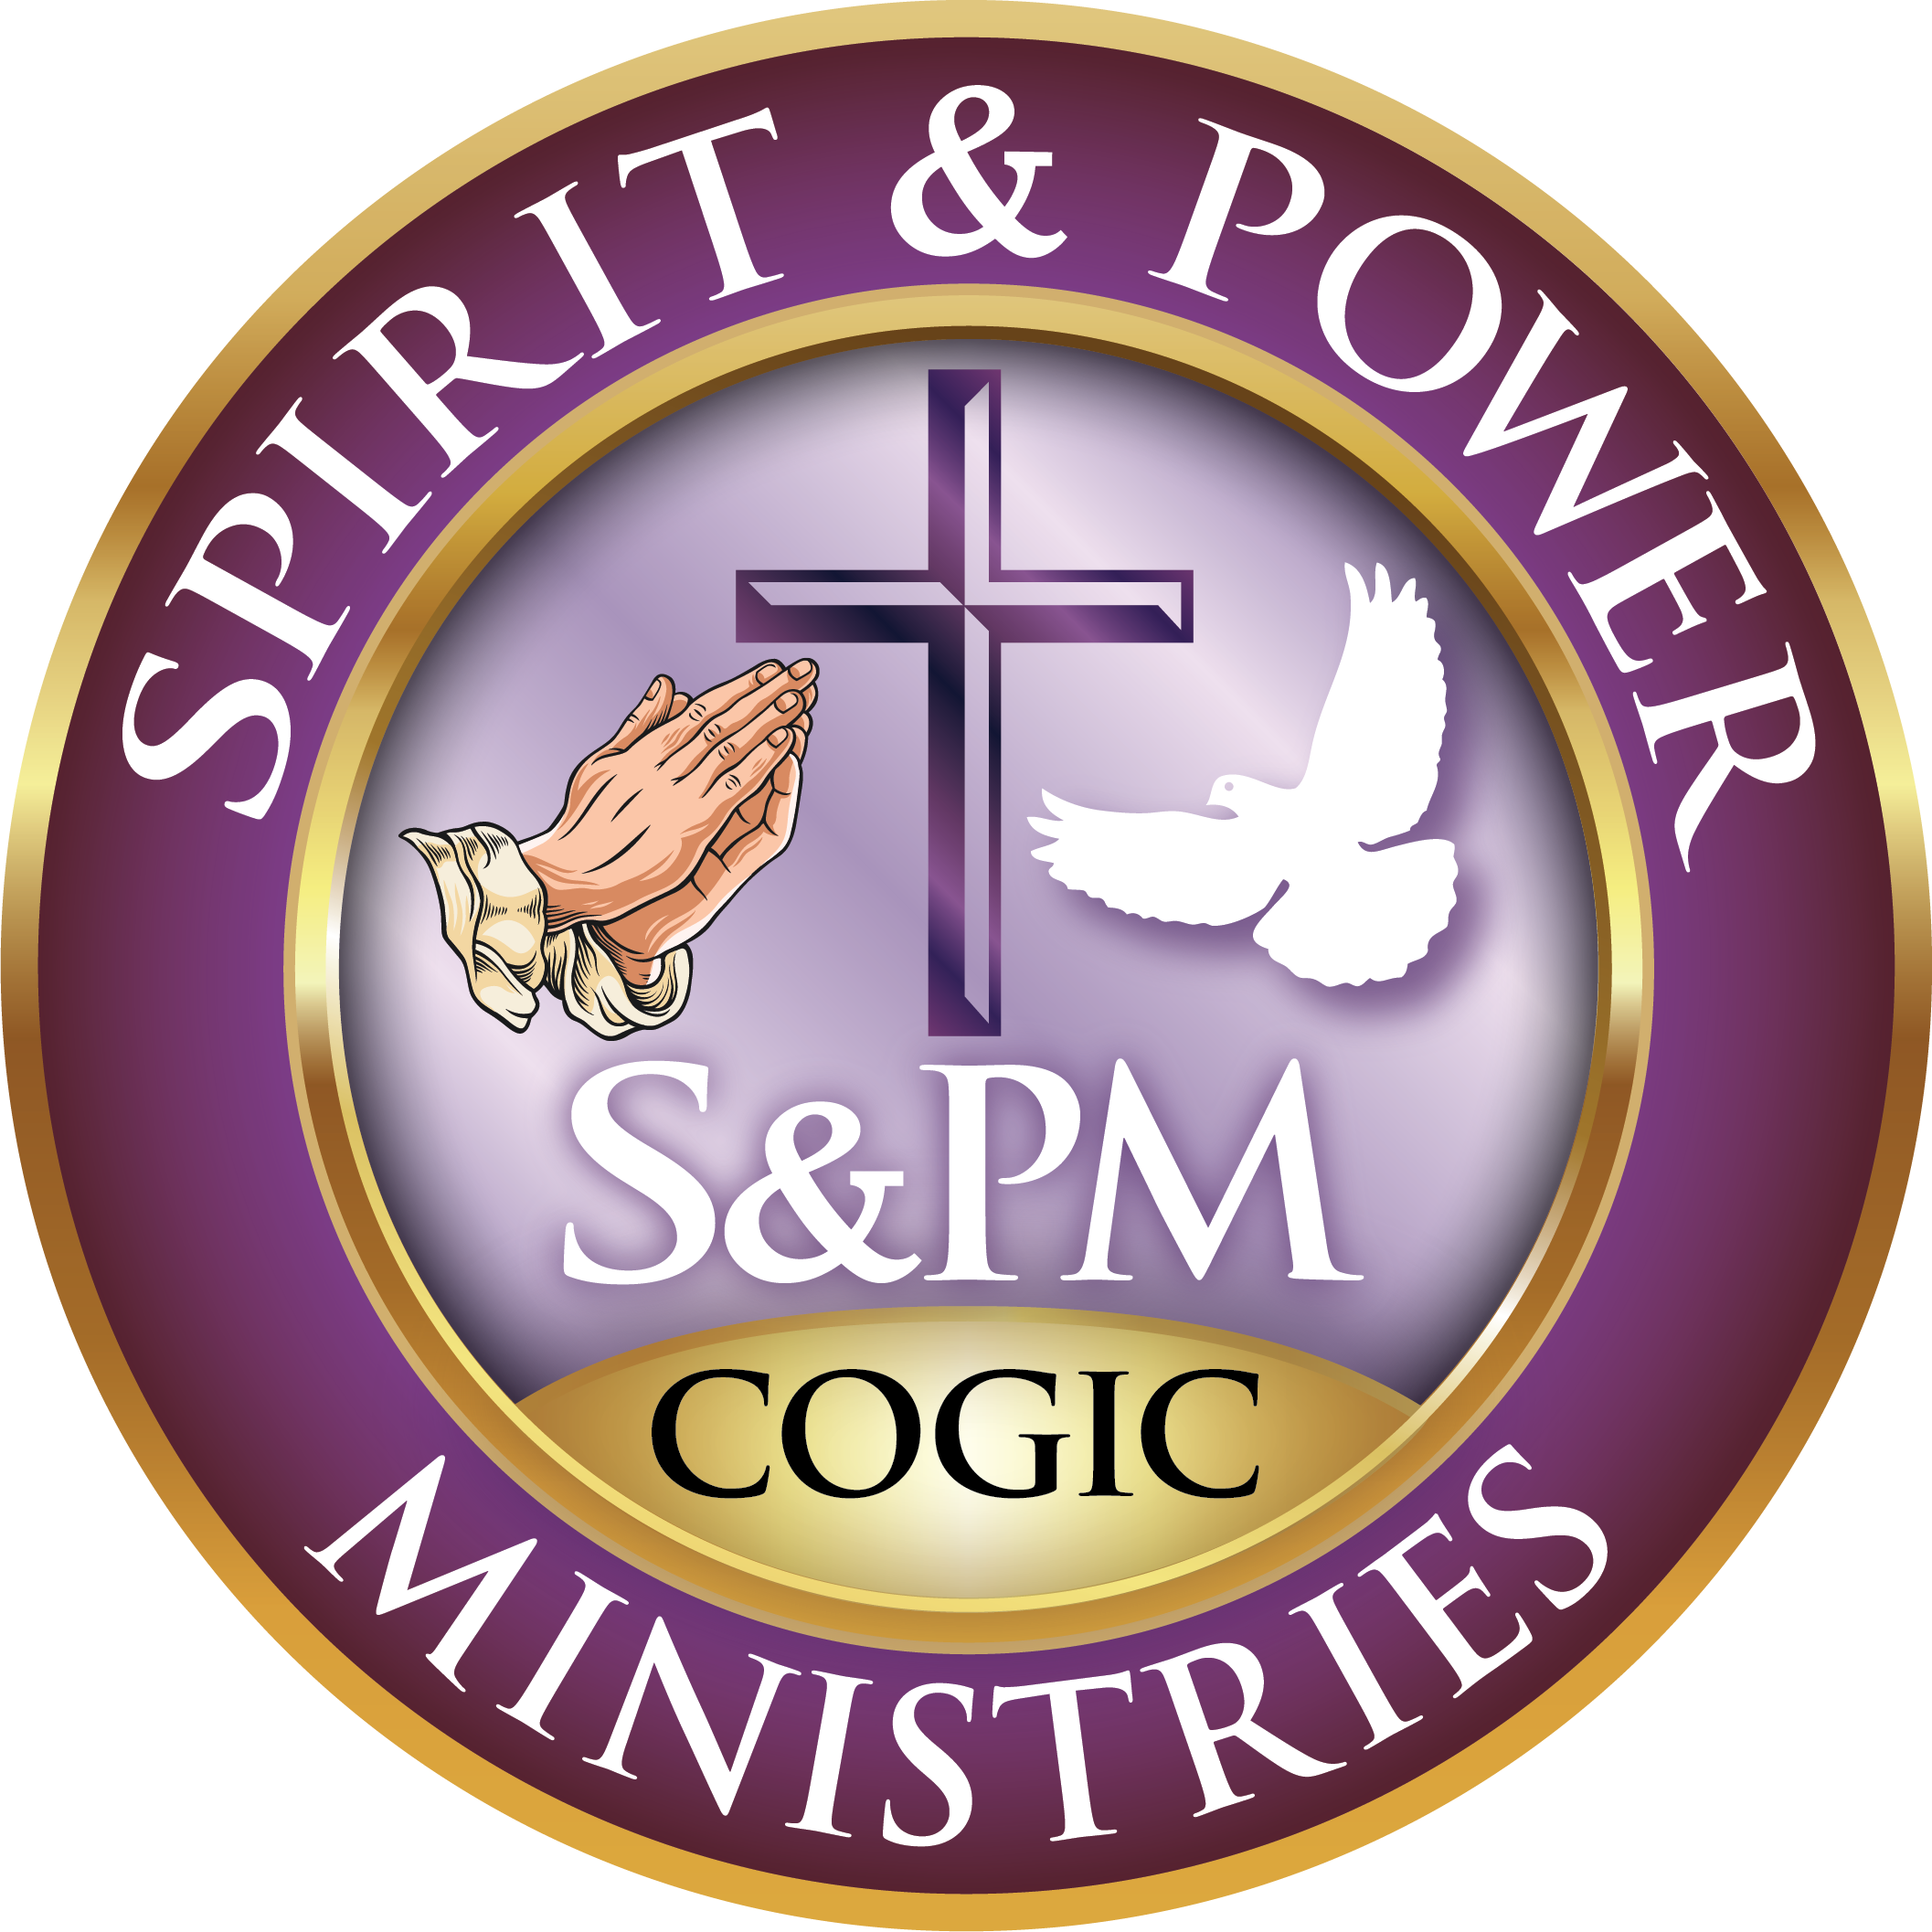 Spirit & Power Ministries COGIC Inc.